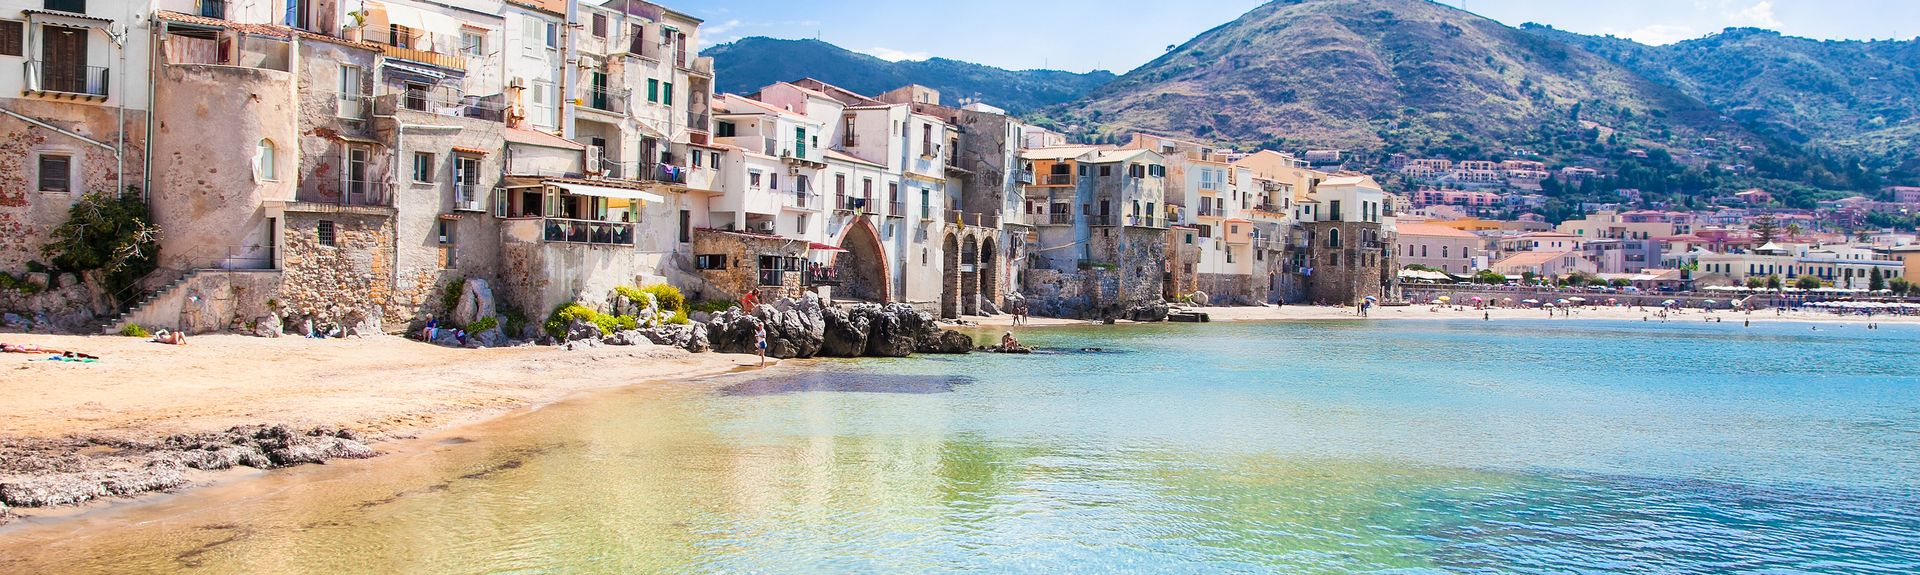 Palermo, Sisilia, Italia